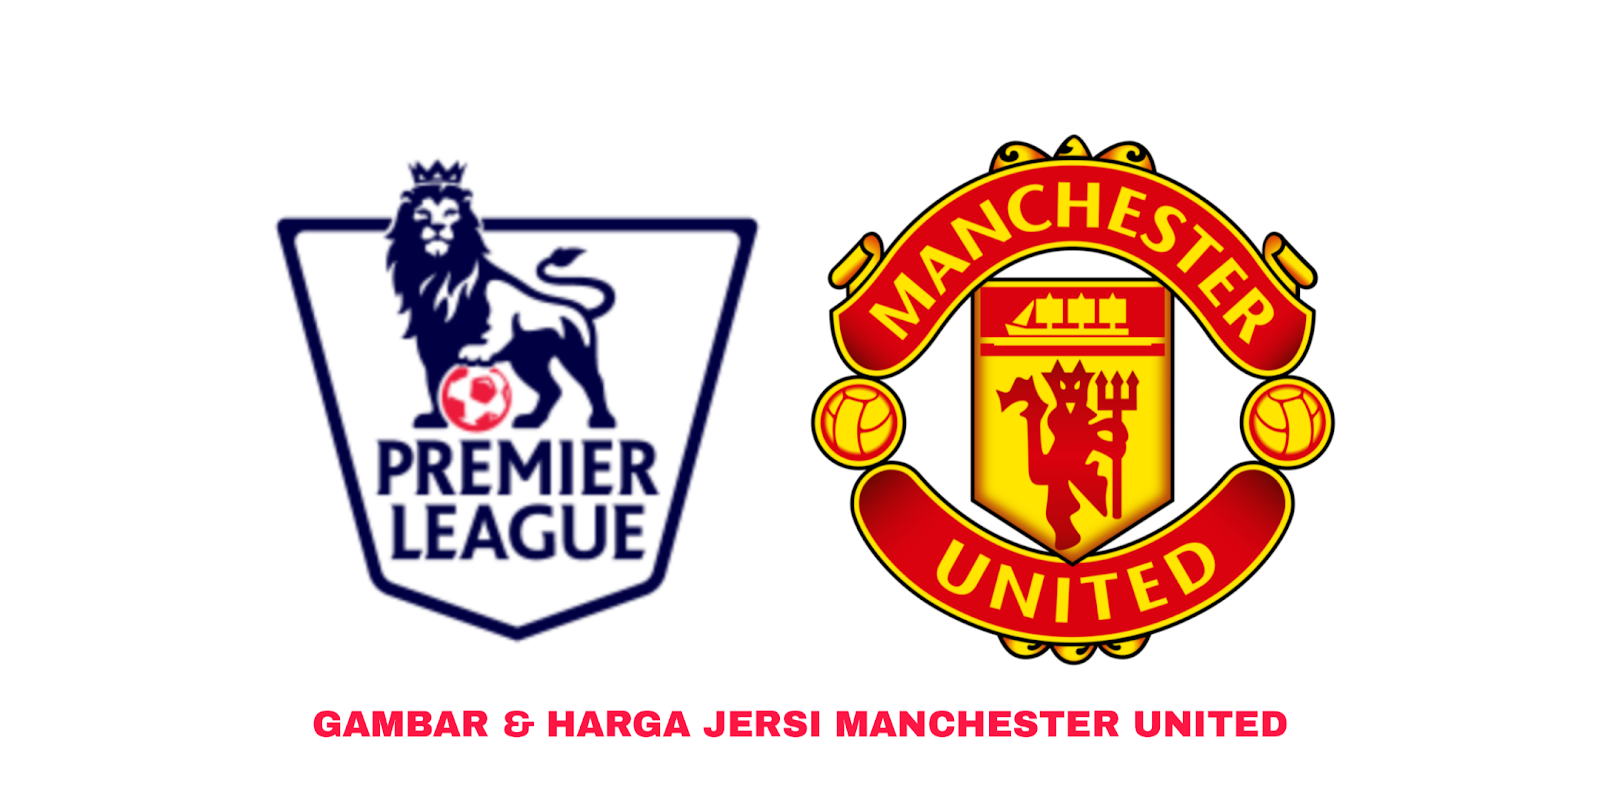 Gambar Dan Harga Jersi Baru Manchester United 2020 2021 MY